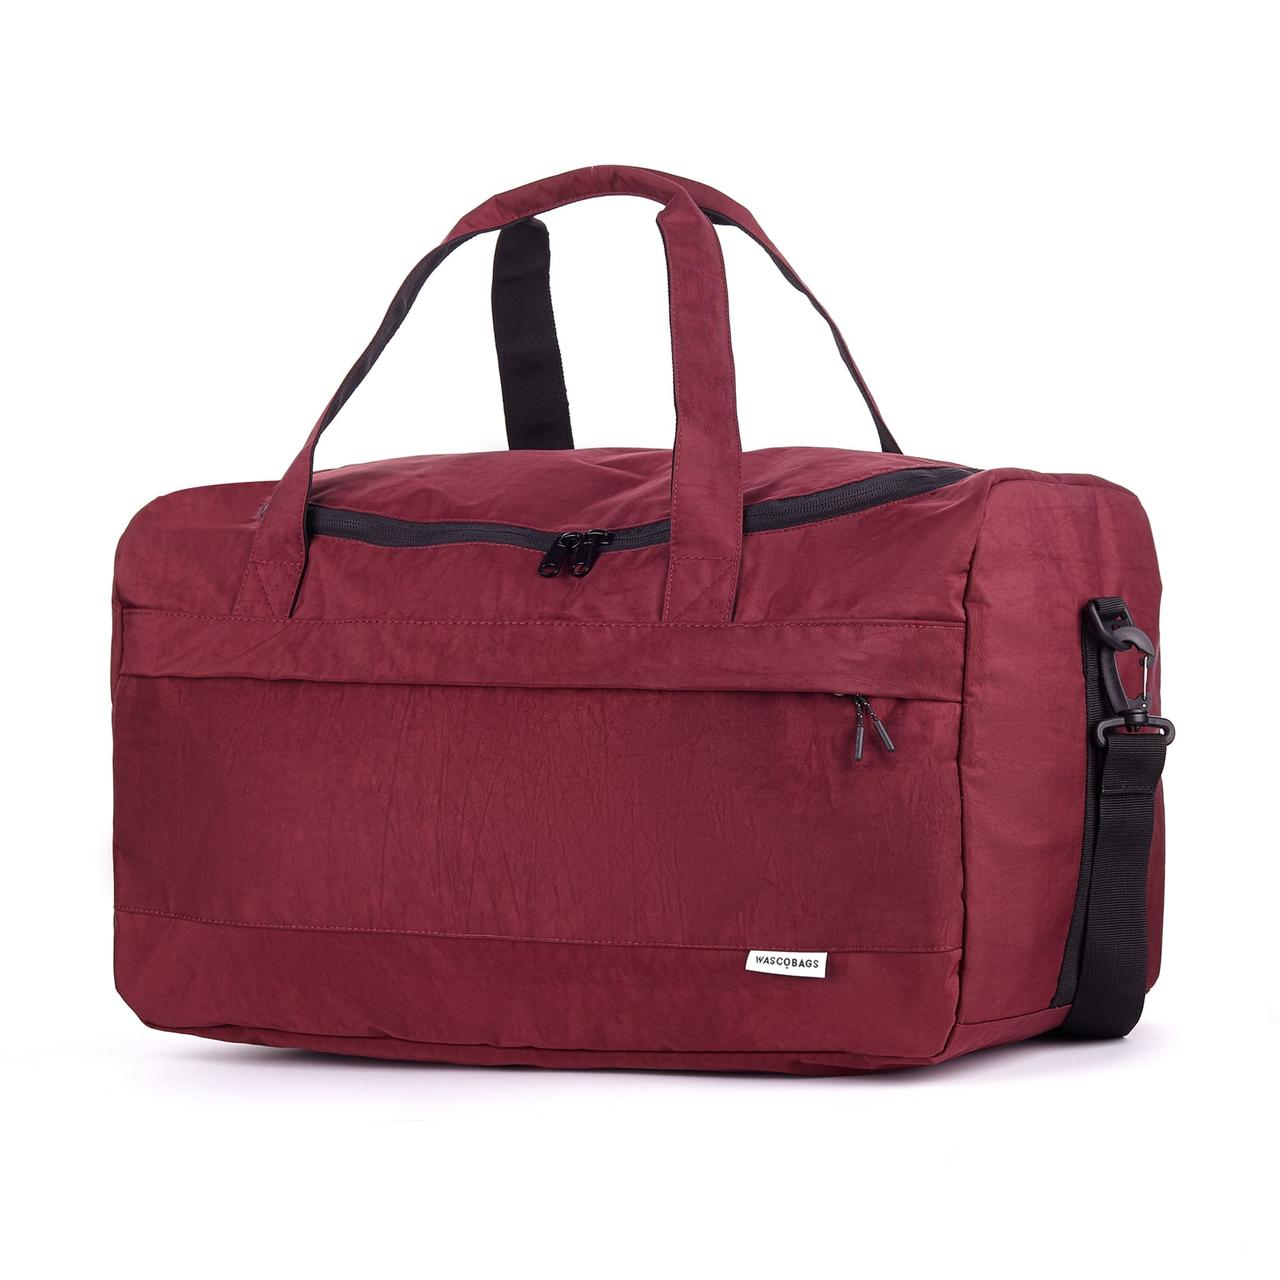 Дорожная сумка Wascobags Warsaw Бордо (34 L)